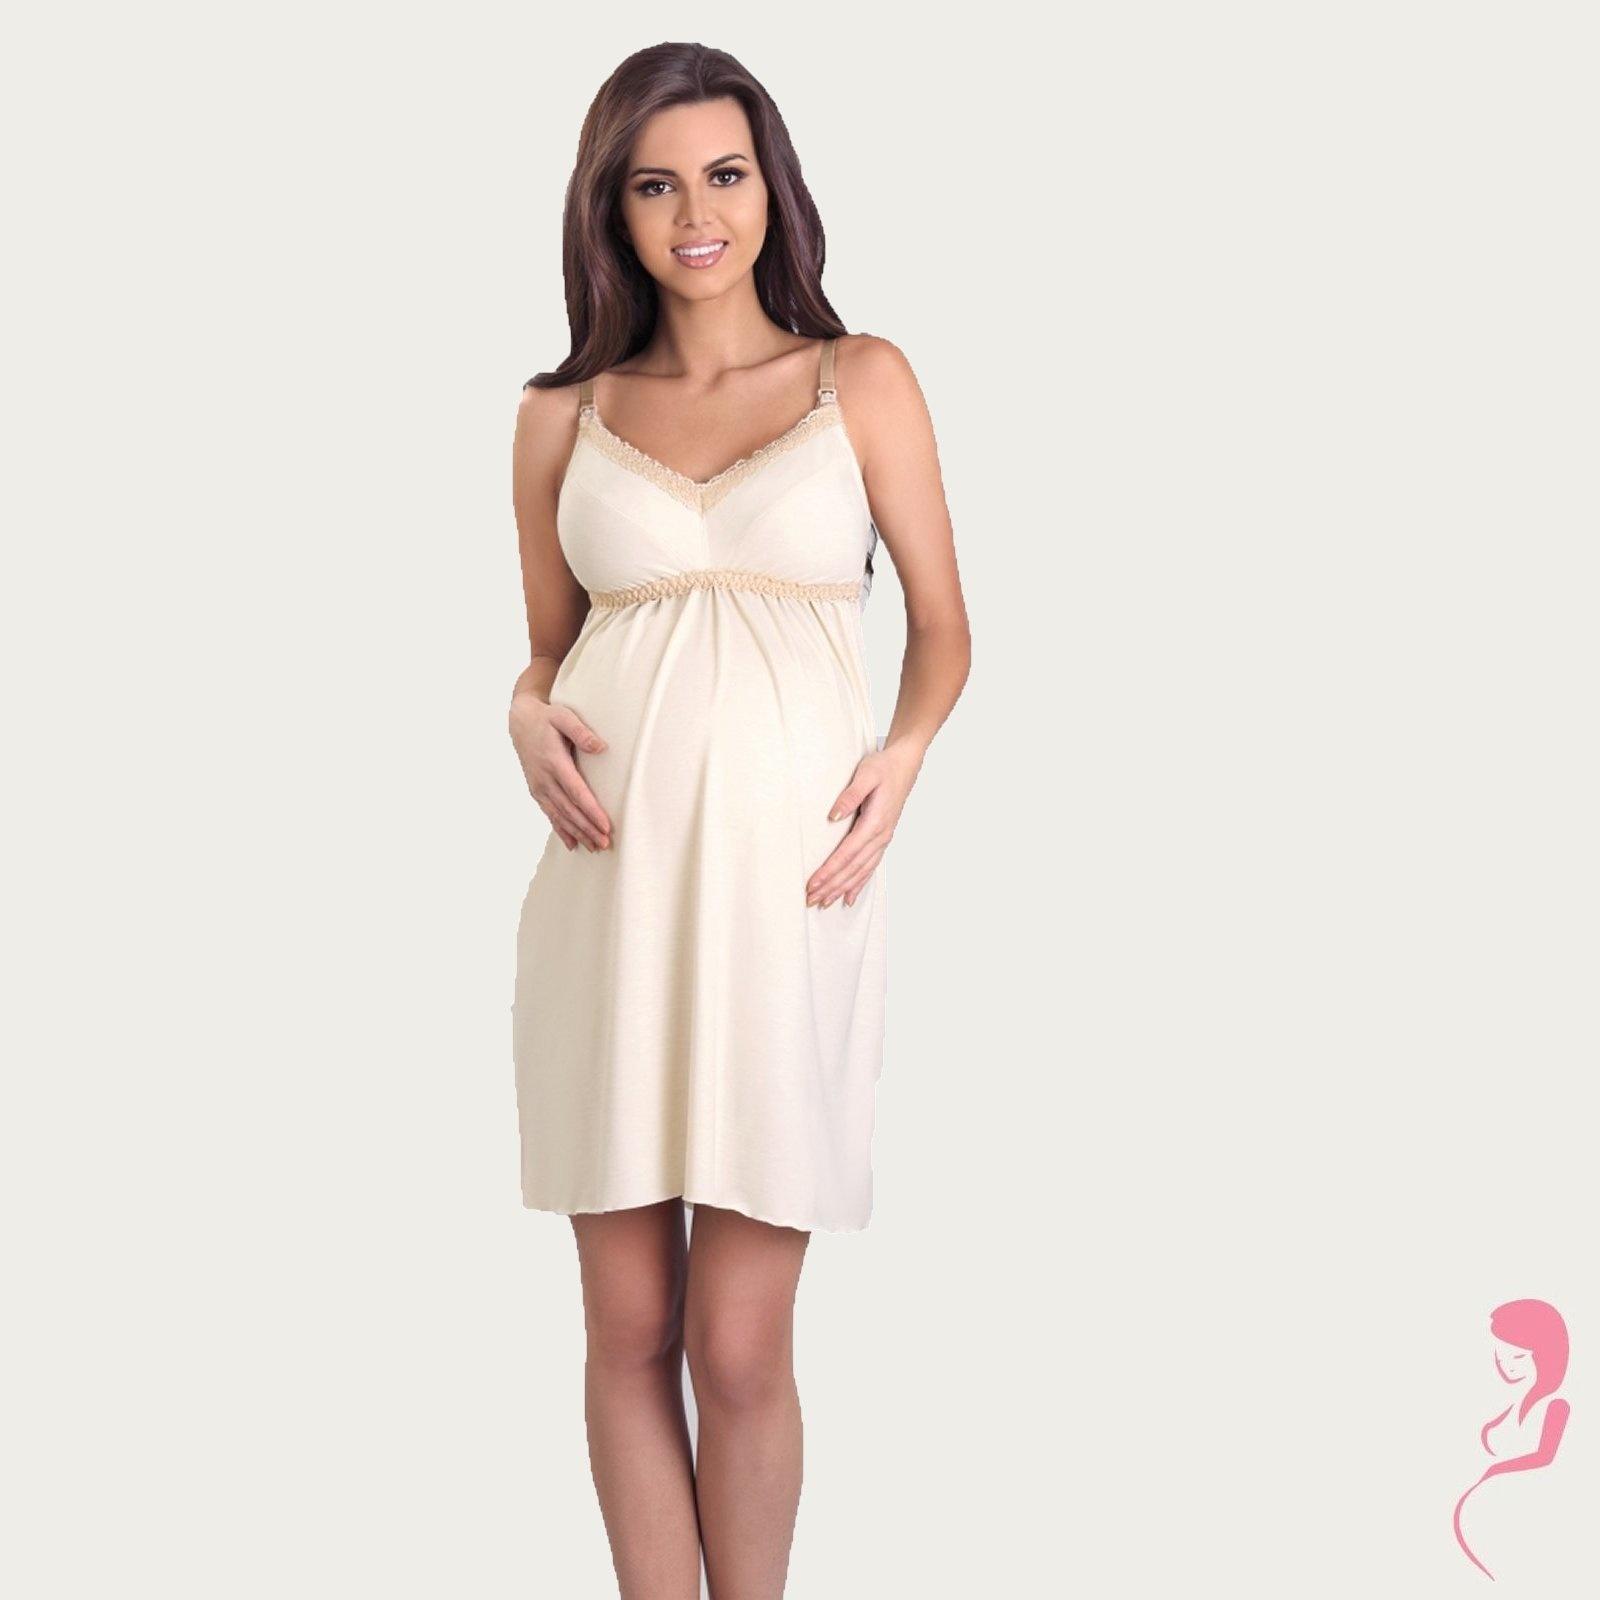 Lupoline Zwangerschapsjurk - Voedingsjurk Creamy